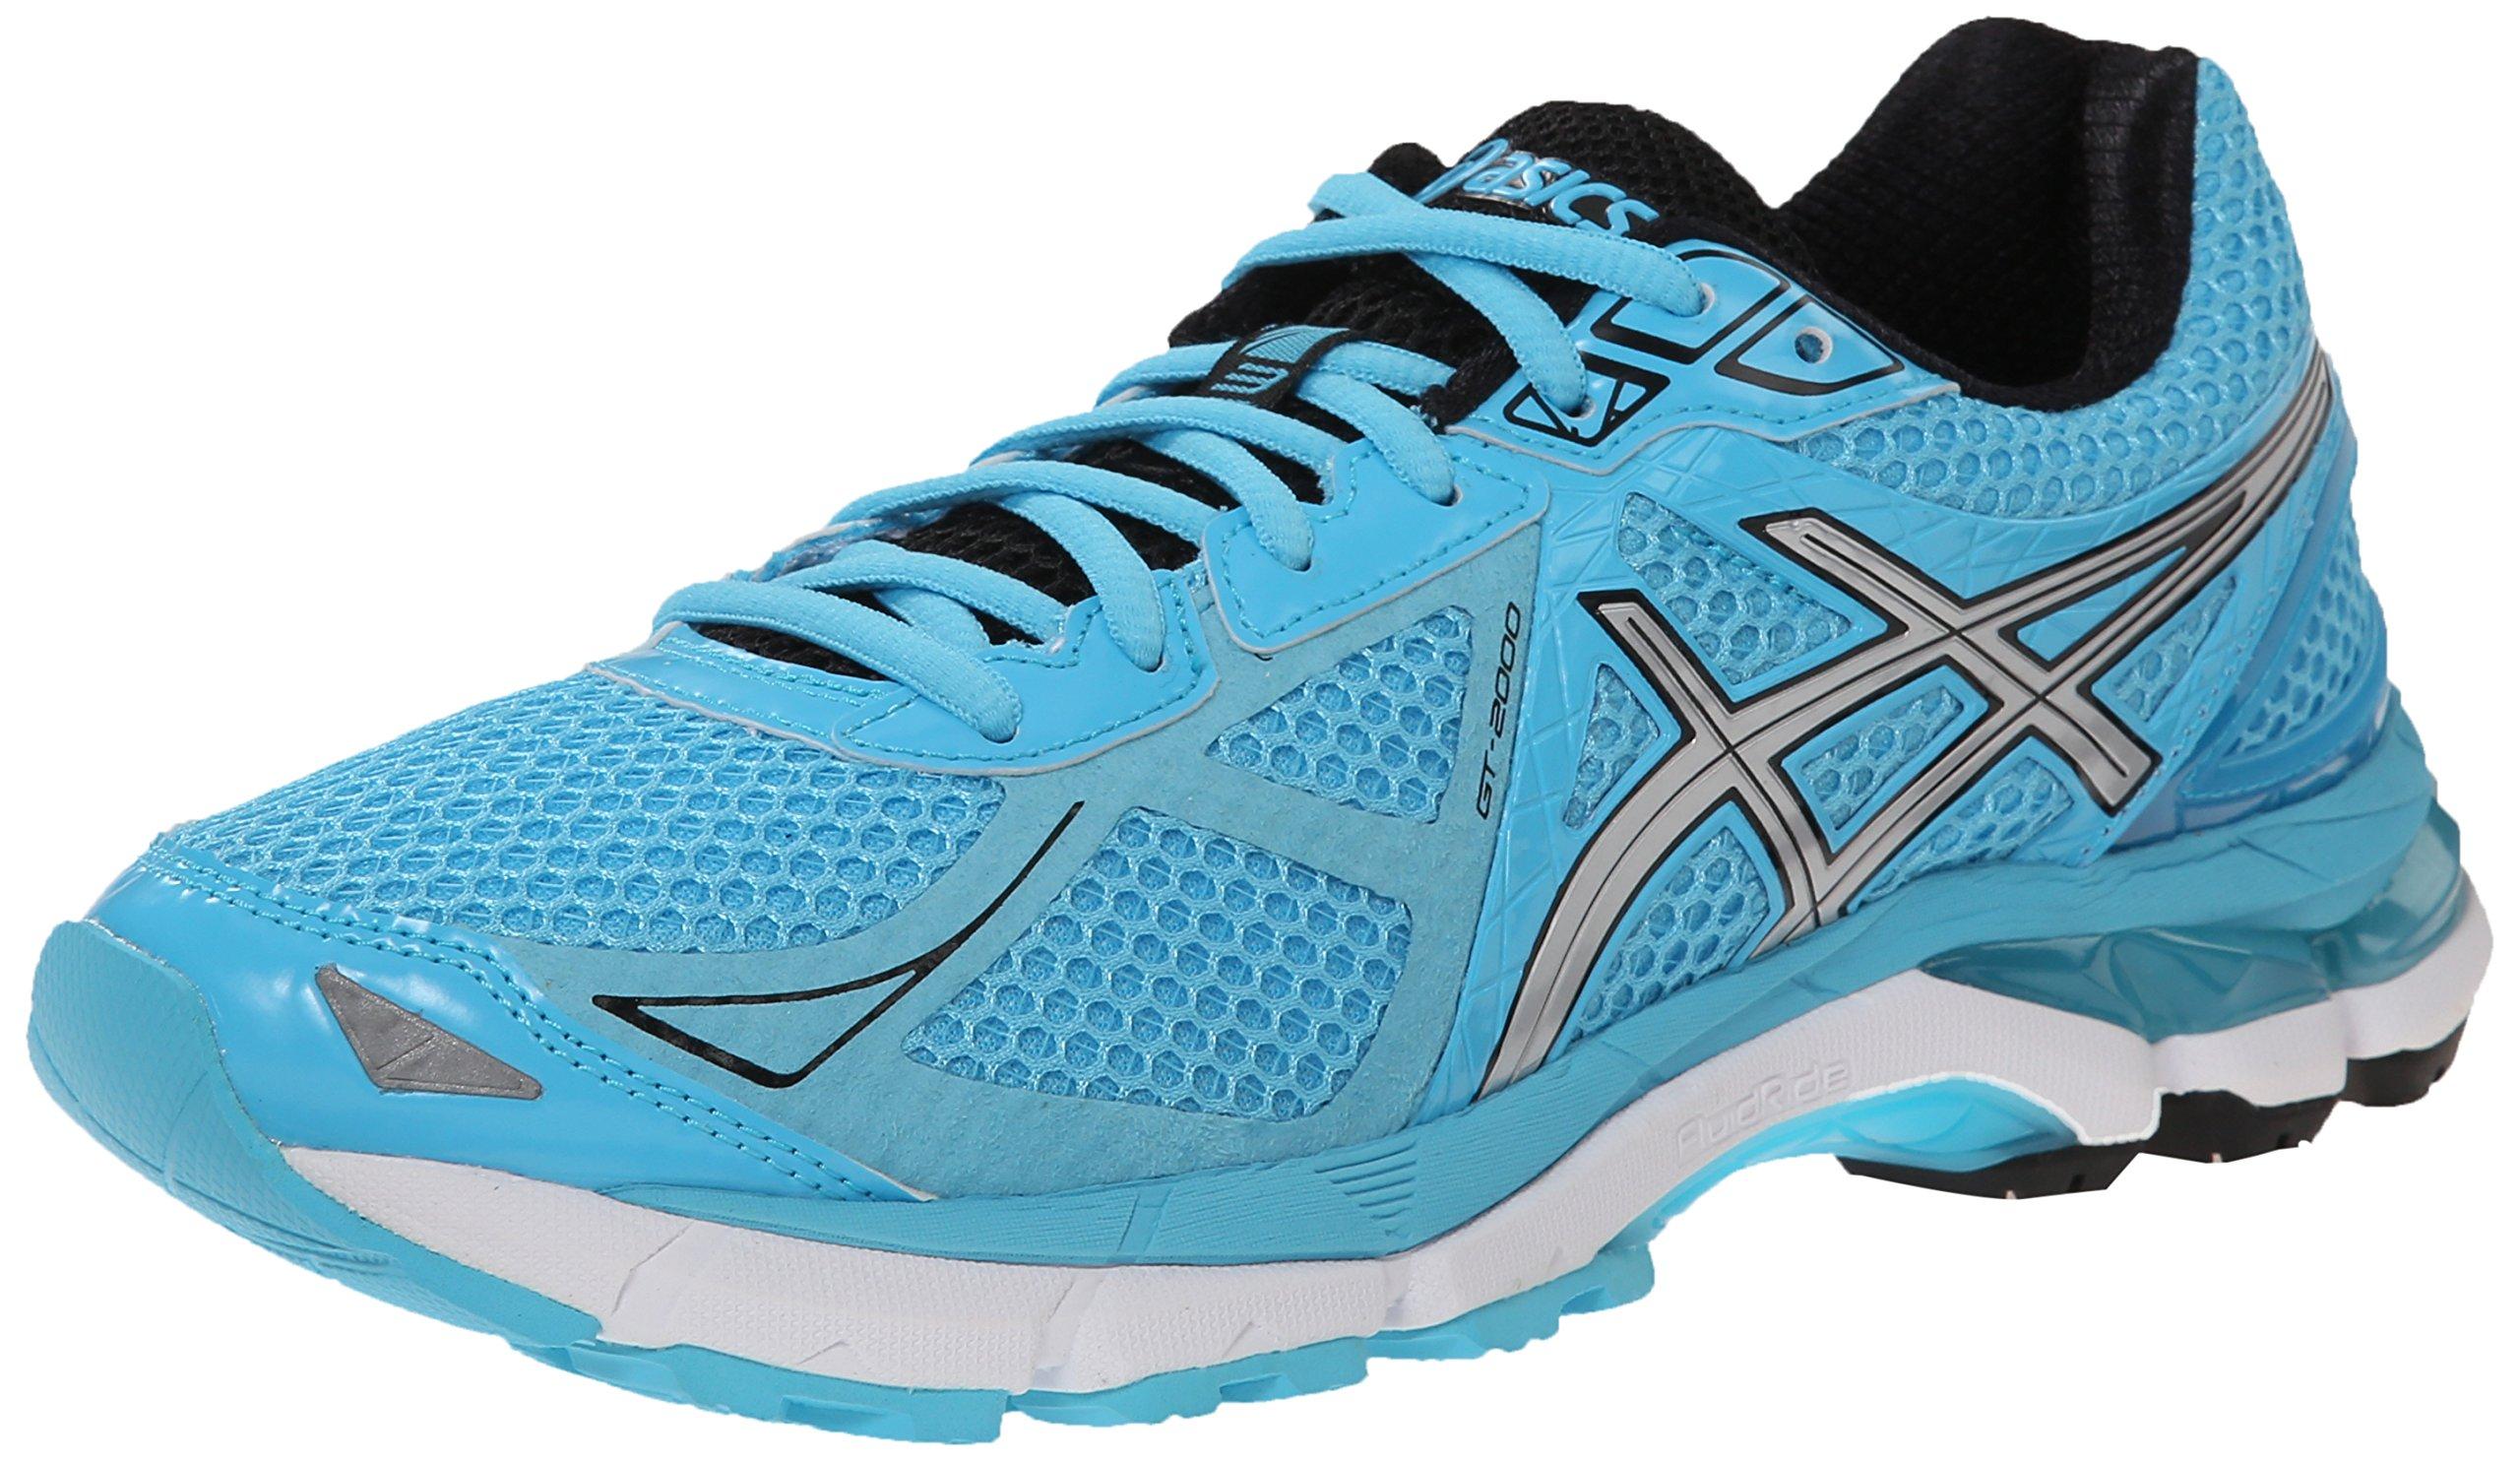 ASICS Women's GT-2000 3 Running Shoe, Turquoise/Silver/Black, 5 M US